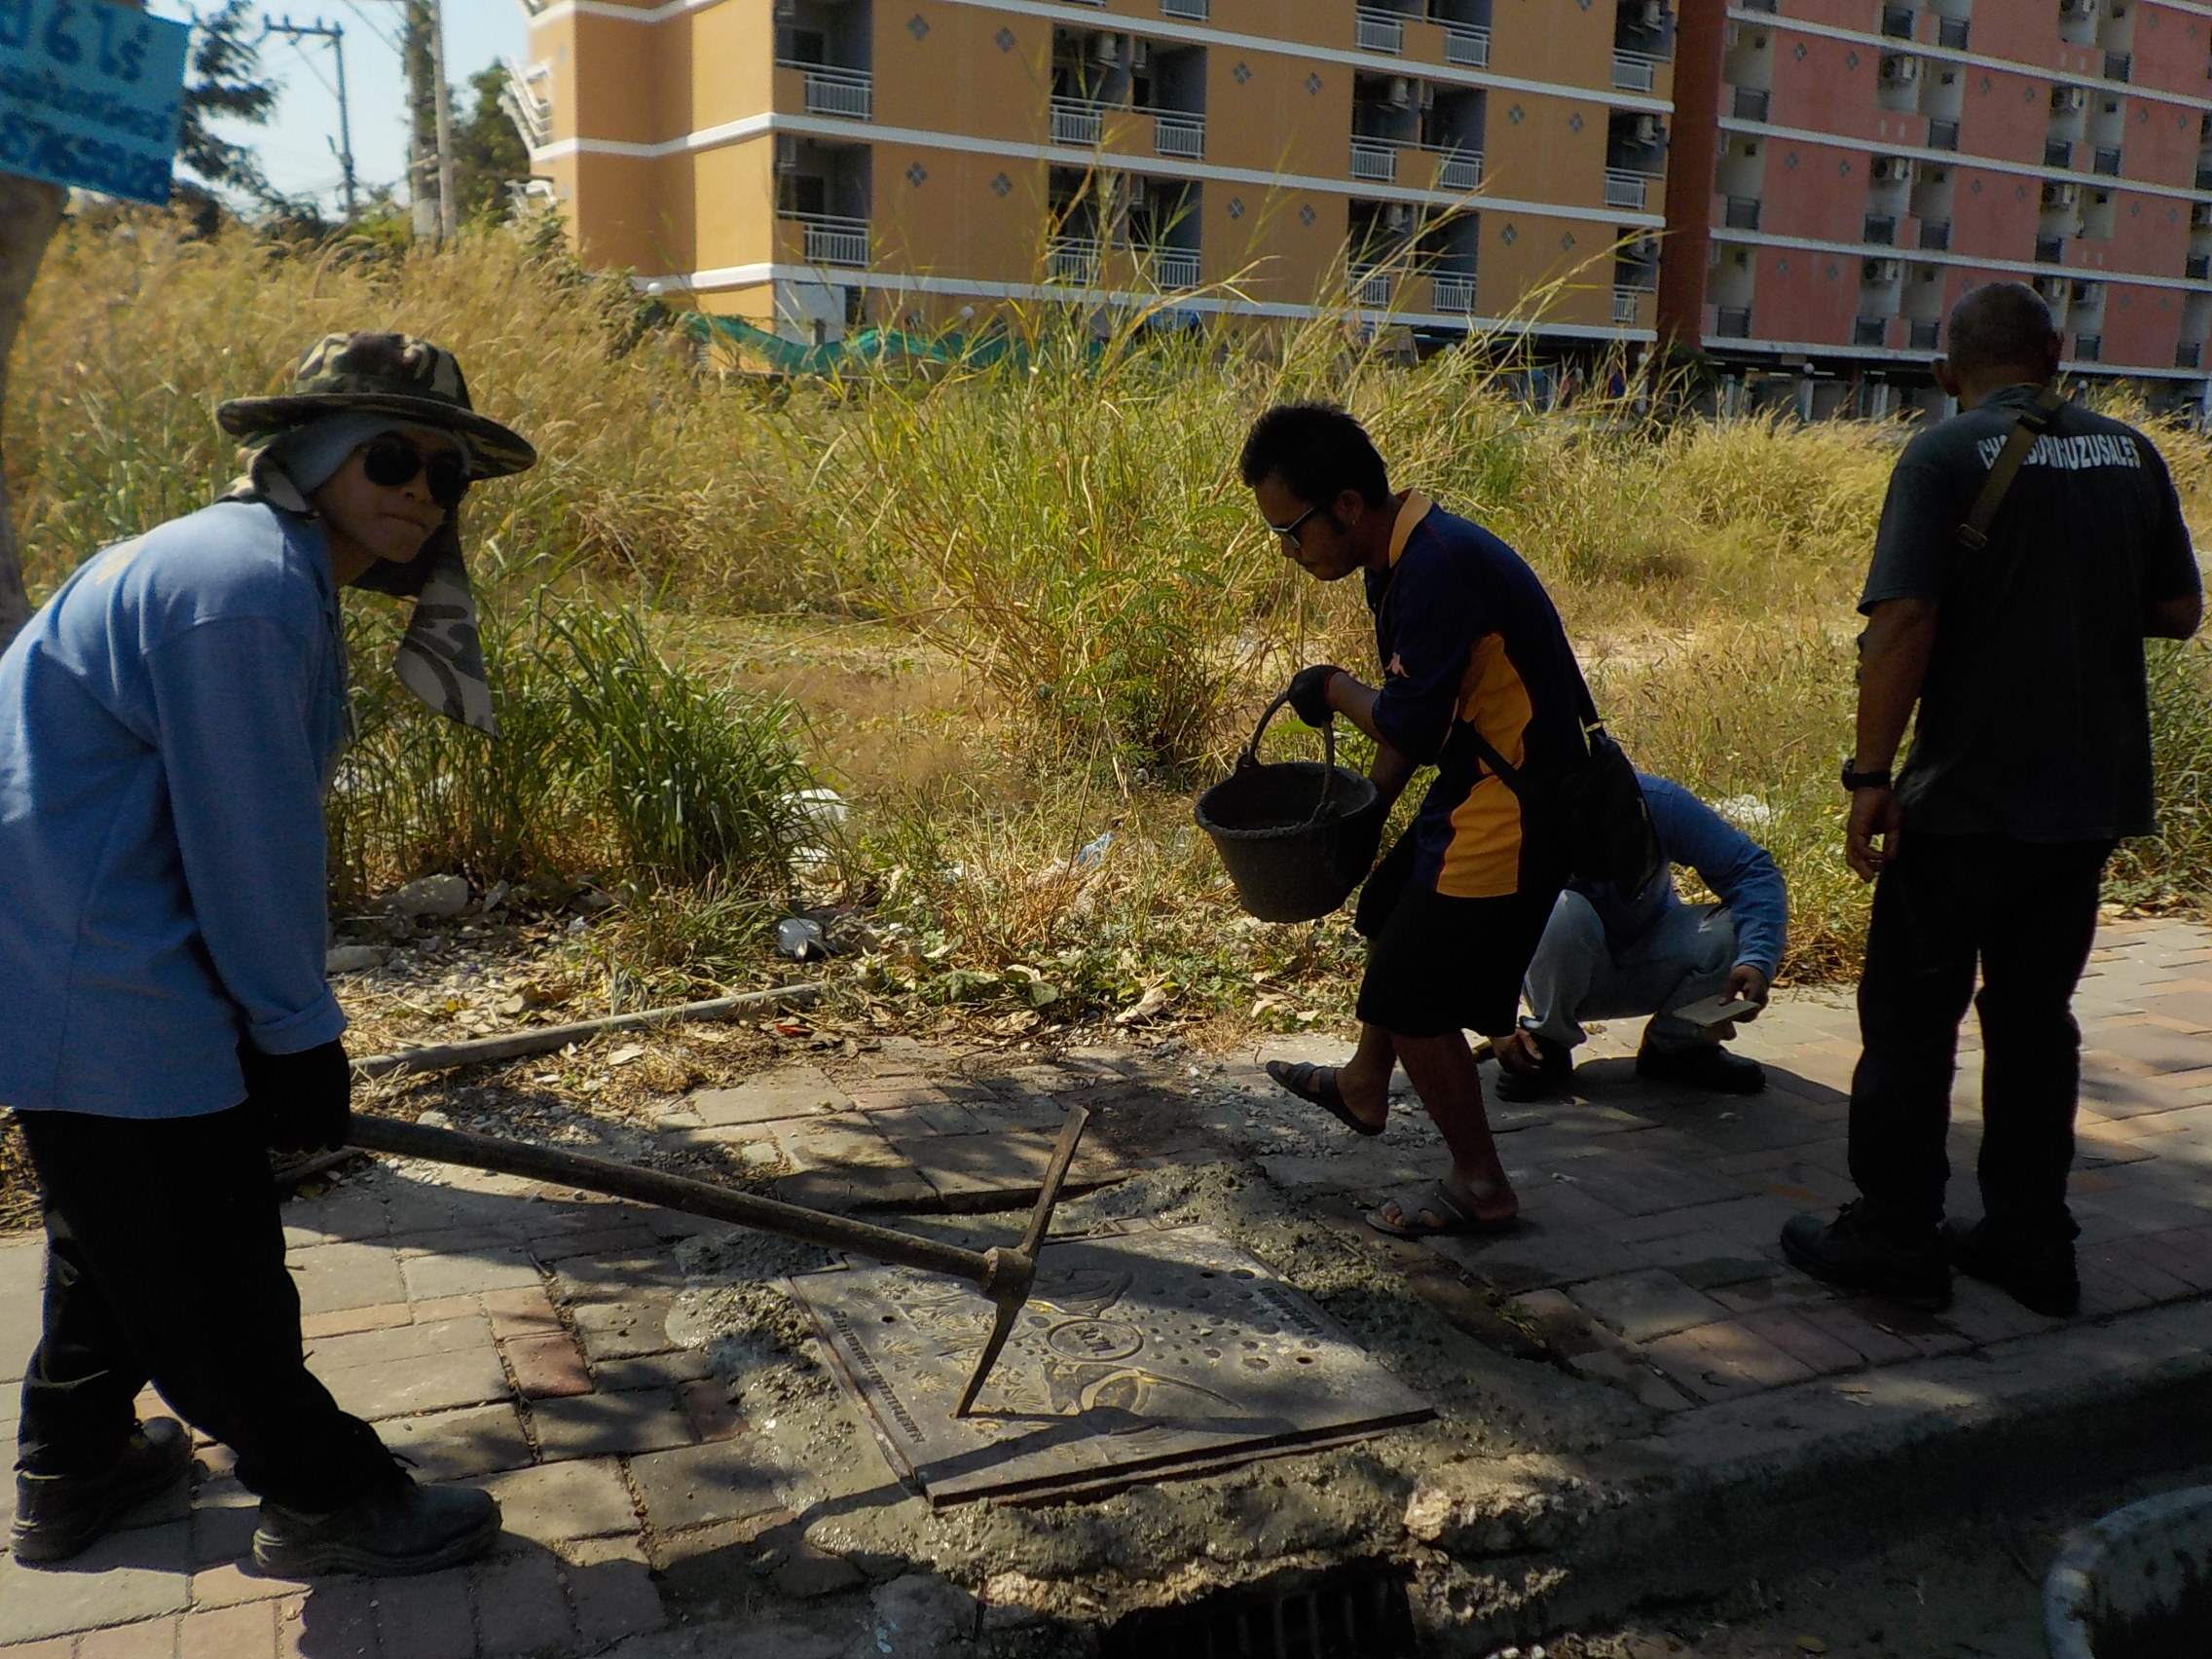 Pattaya city workers repair drainage covers posing a hazard to pedestrians near Bali Hai Pier.